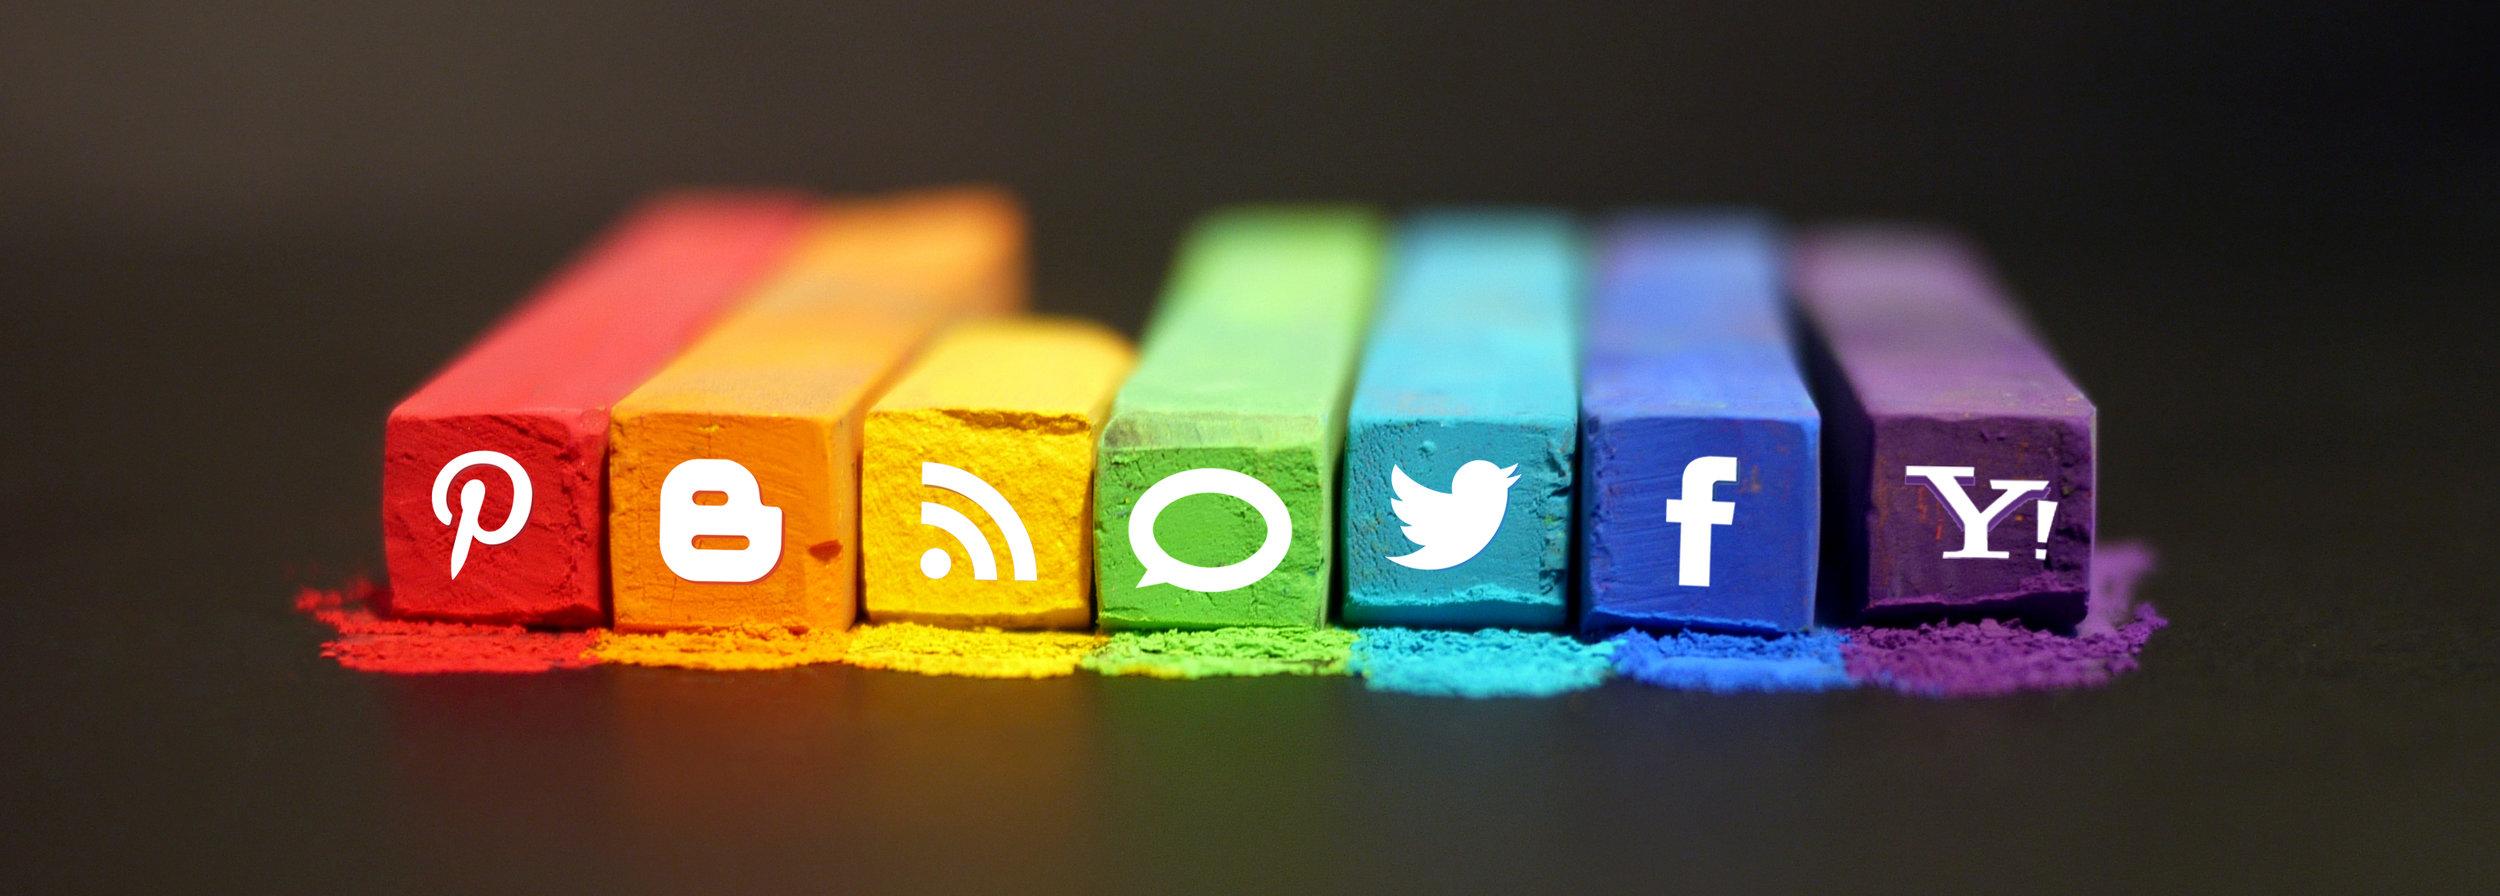 The_Art_of_Social_Media.jpg